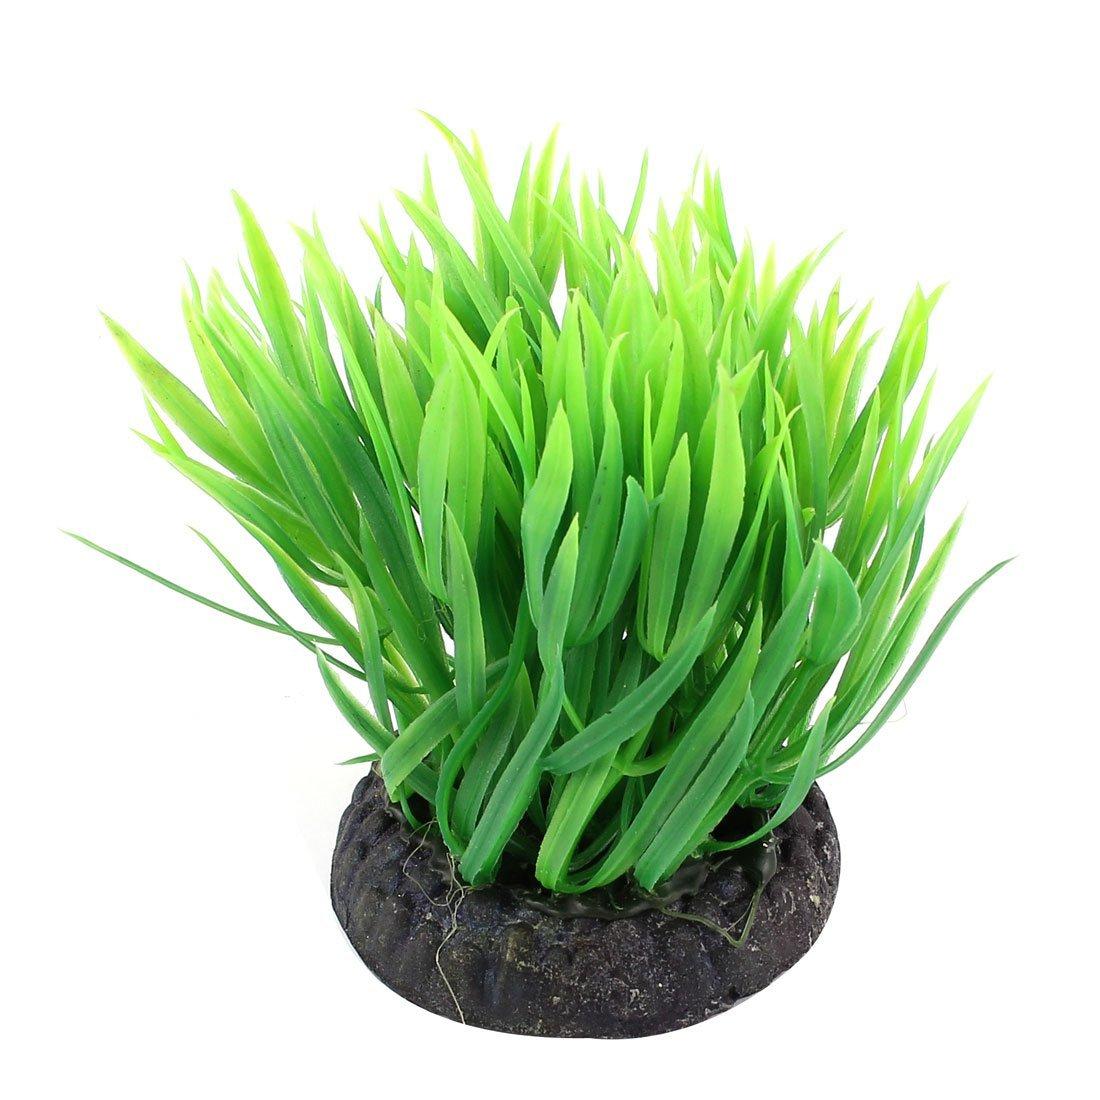 11cm Green Plastic Aquarium Plant Water Grass Ornament for Fish Tank